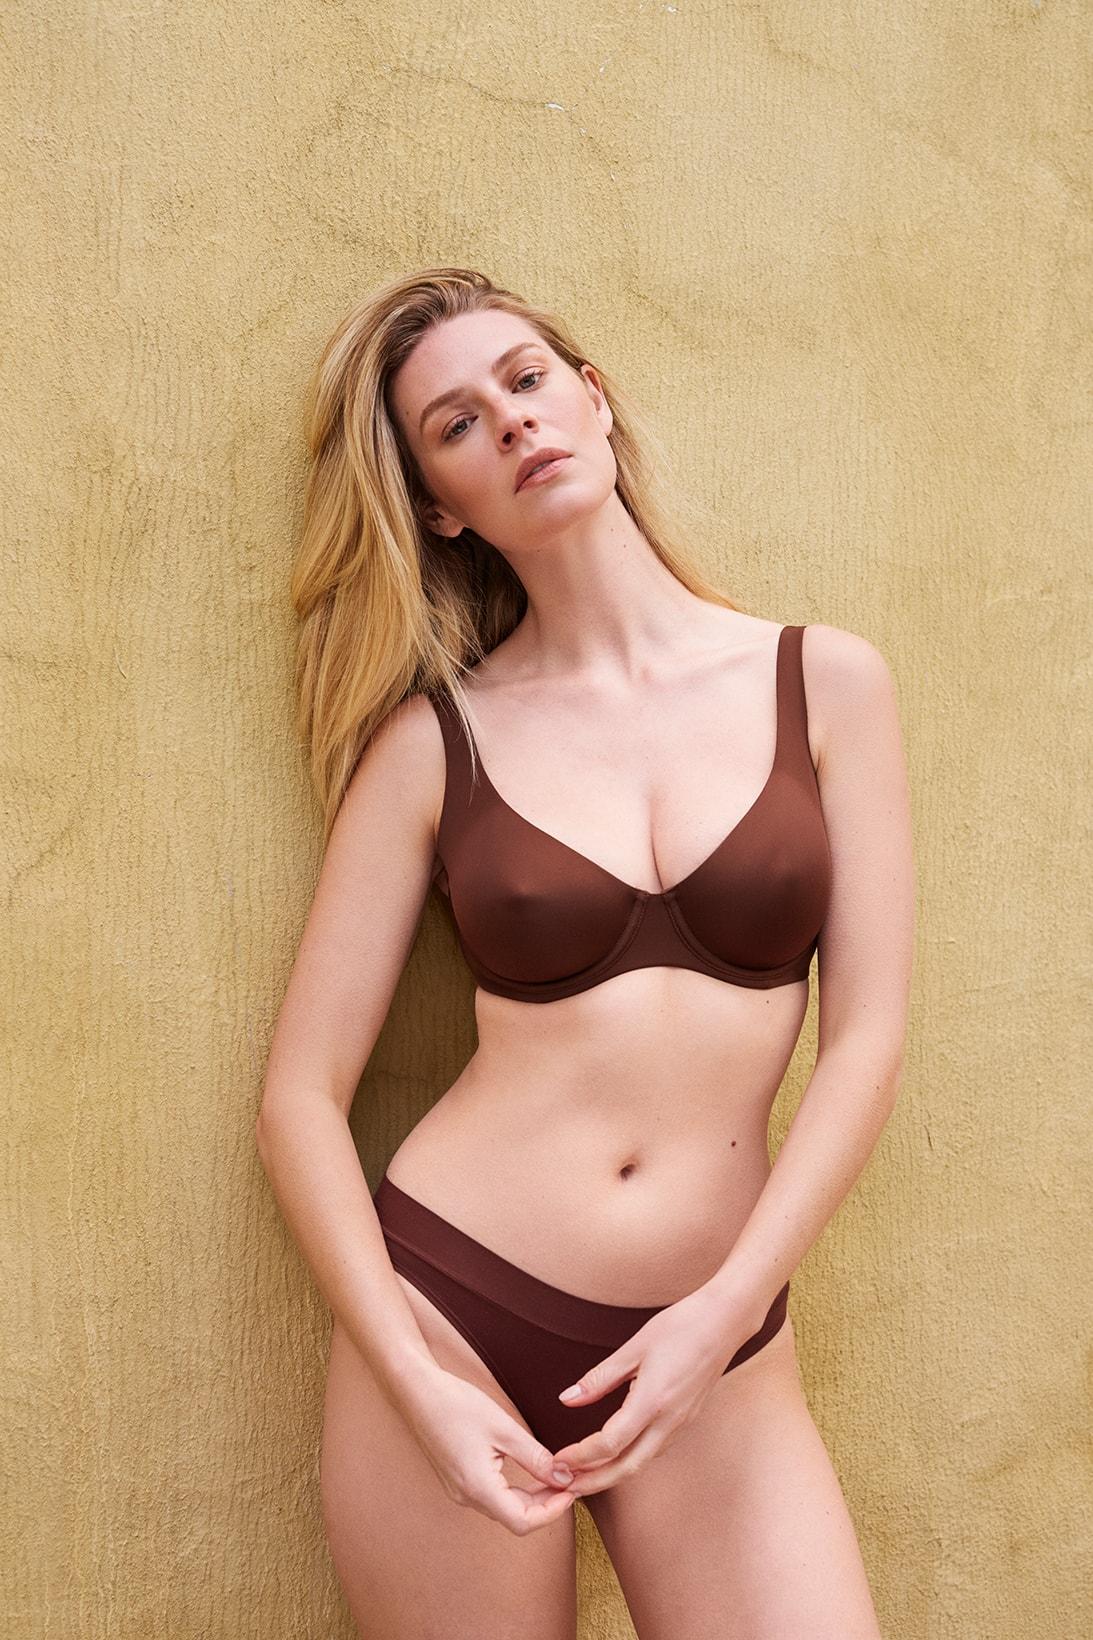 cuup lingerie bras women underwear inclusivity size diversity